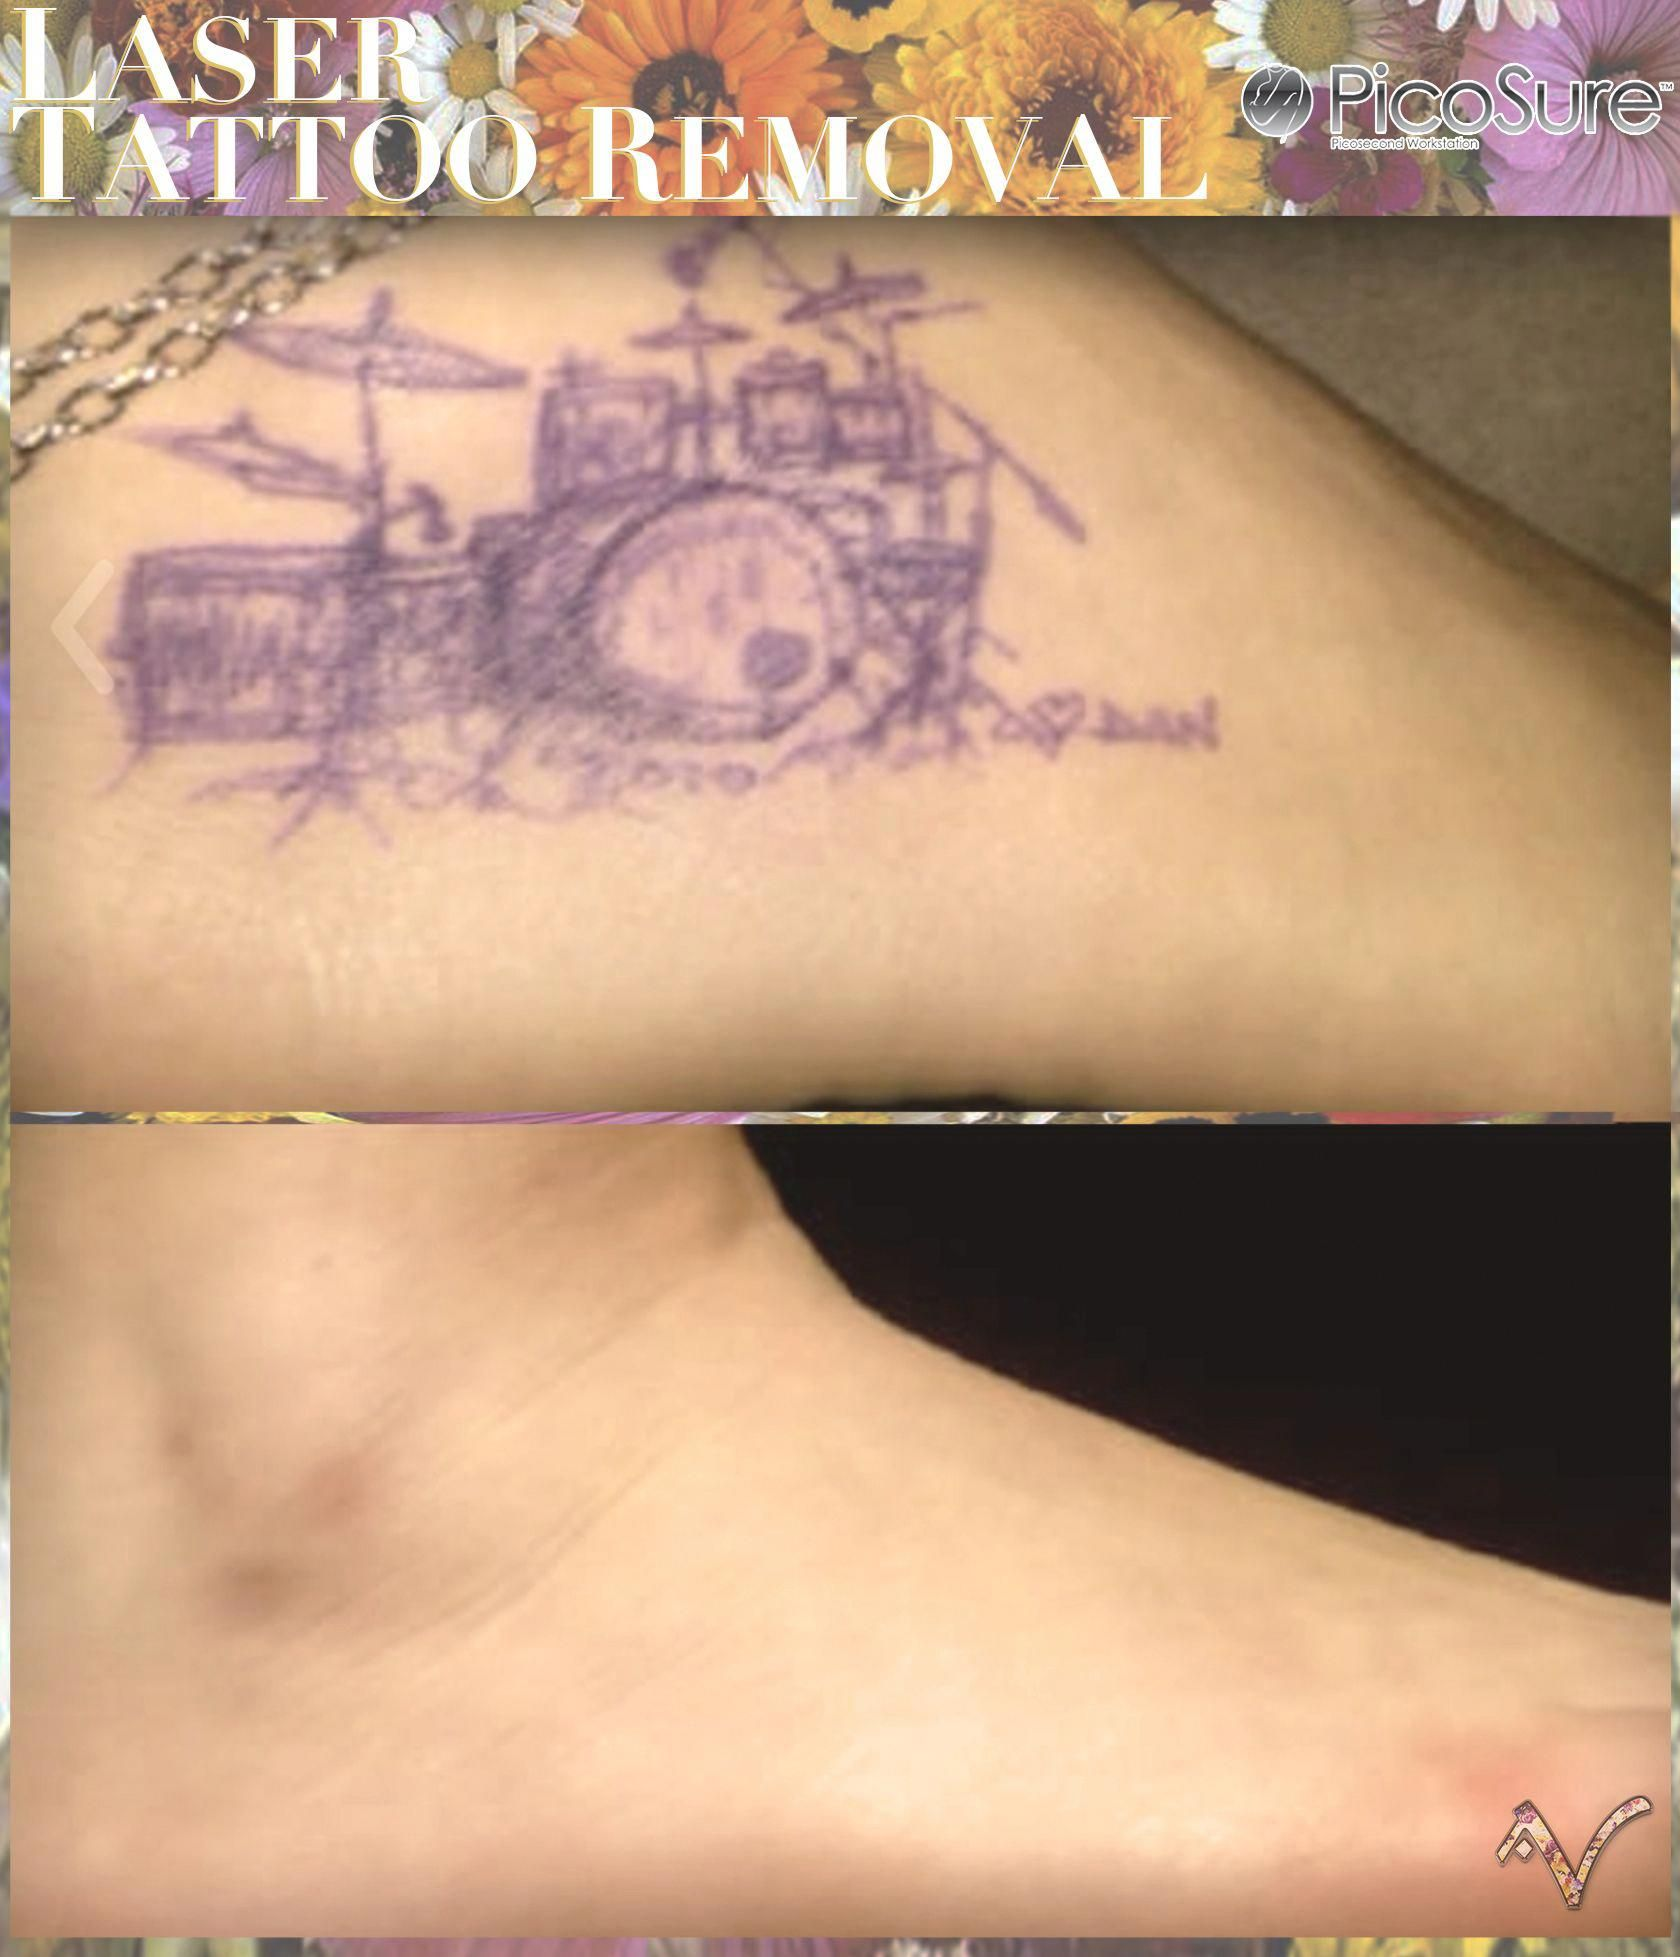 Picosure laser tattoo removal howtoremovetattoos tattoo